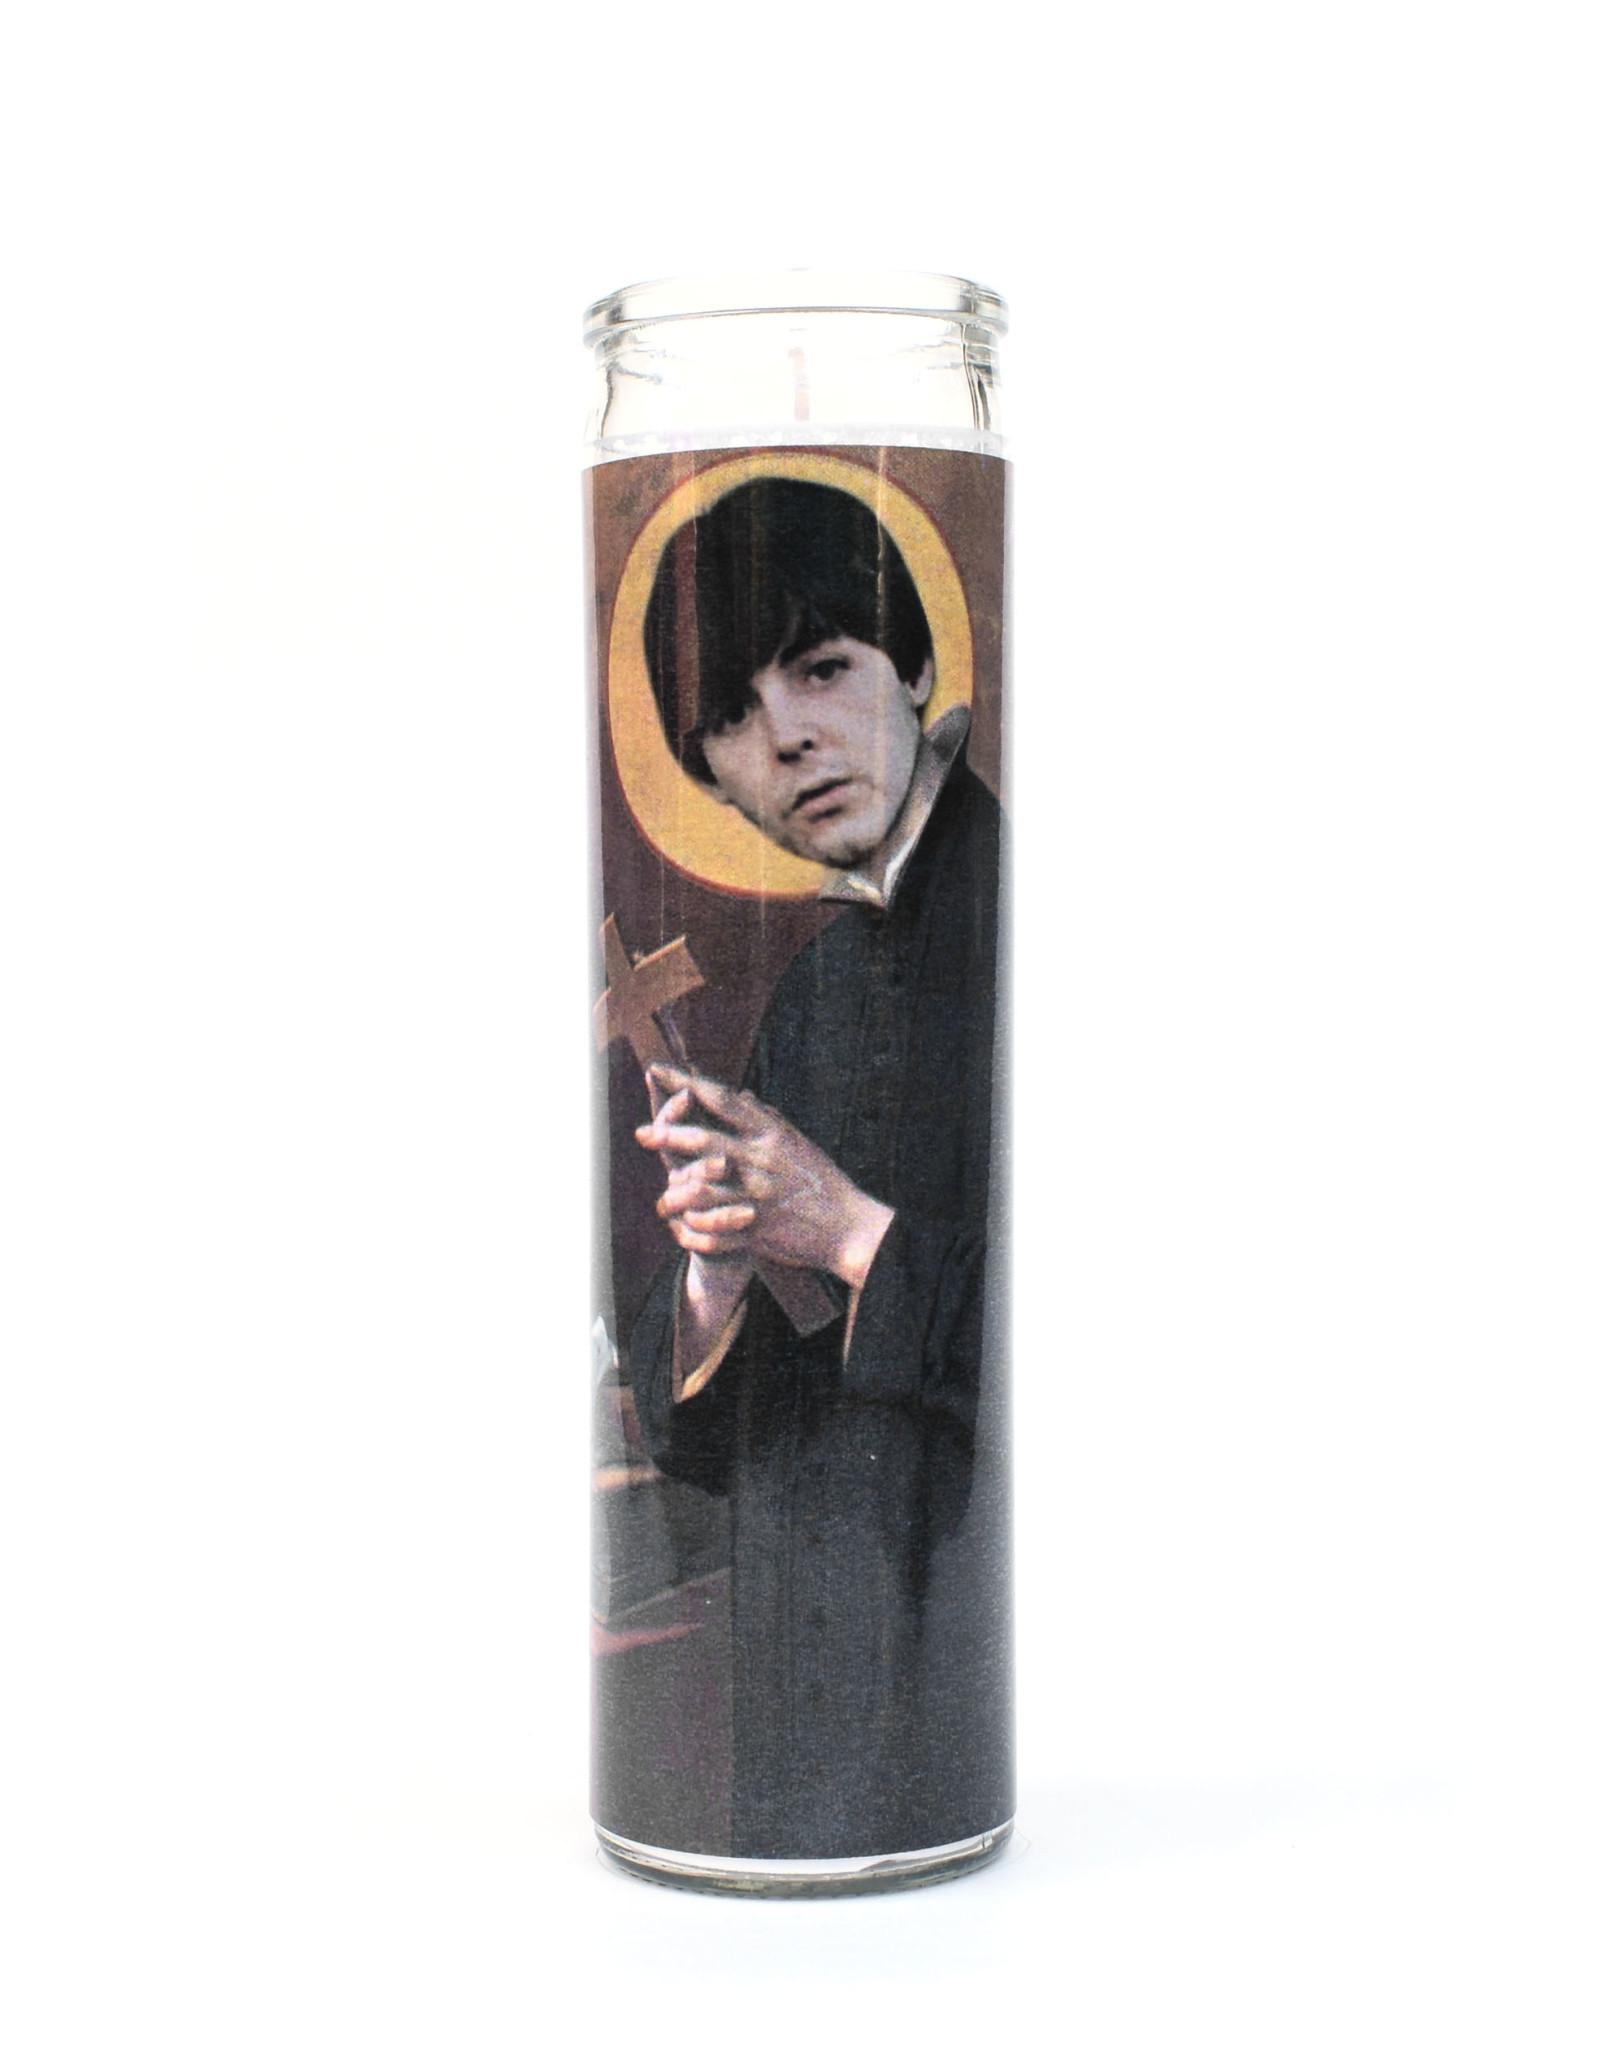 St. Paul (Beatles) Prayer Candle